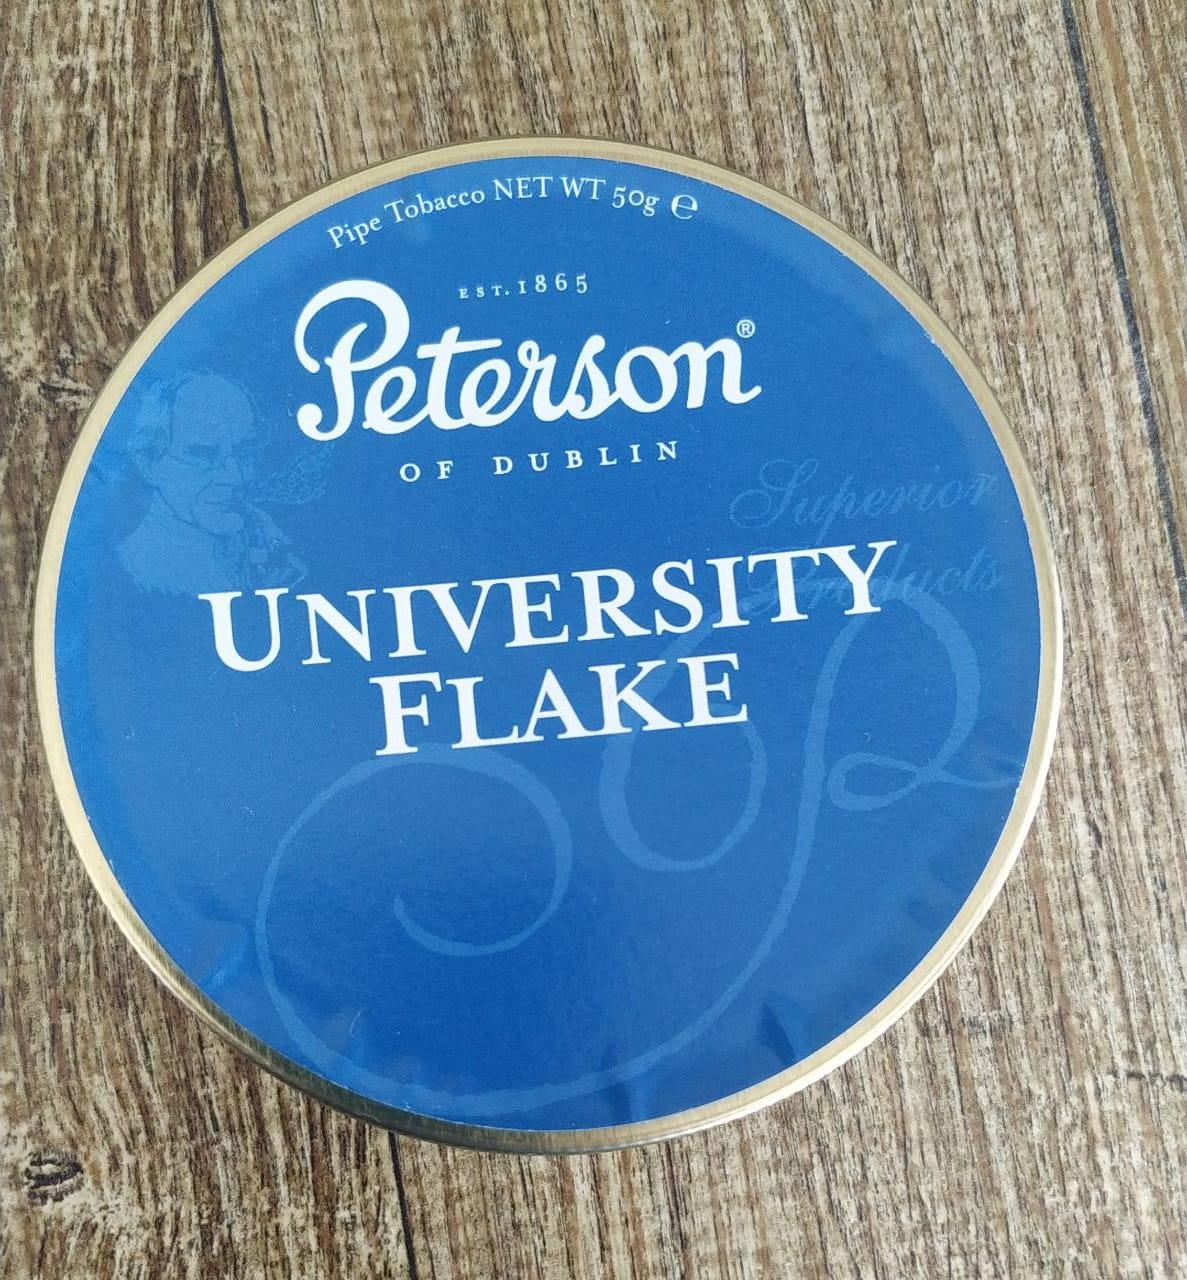 Peterson - University Flake